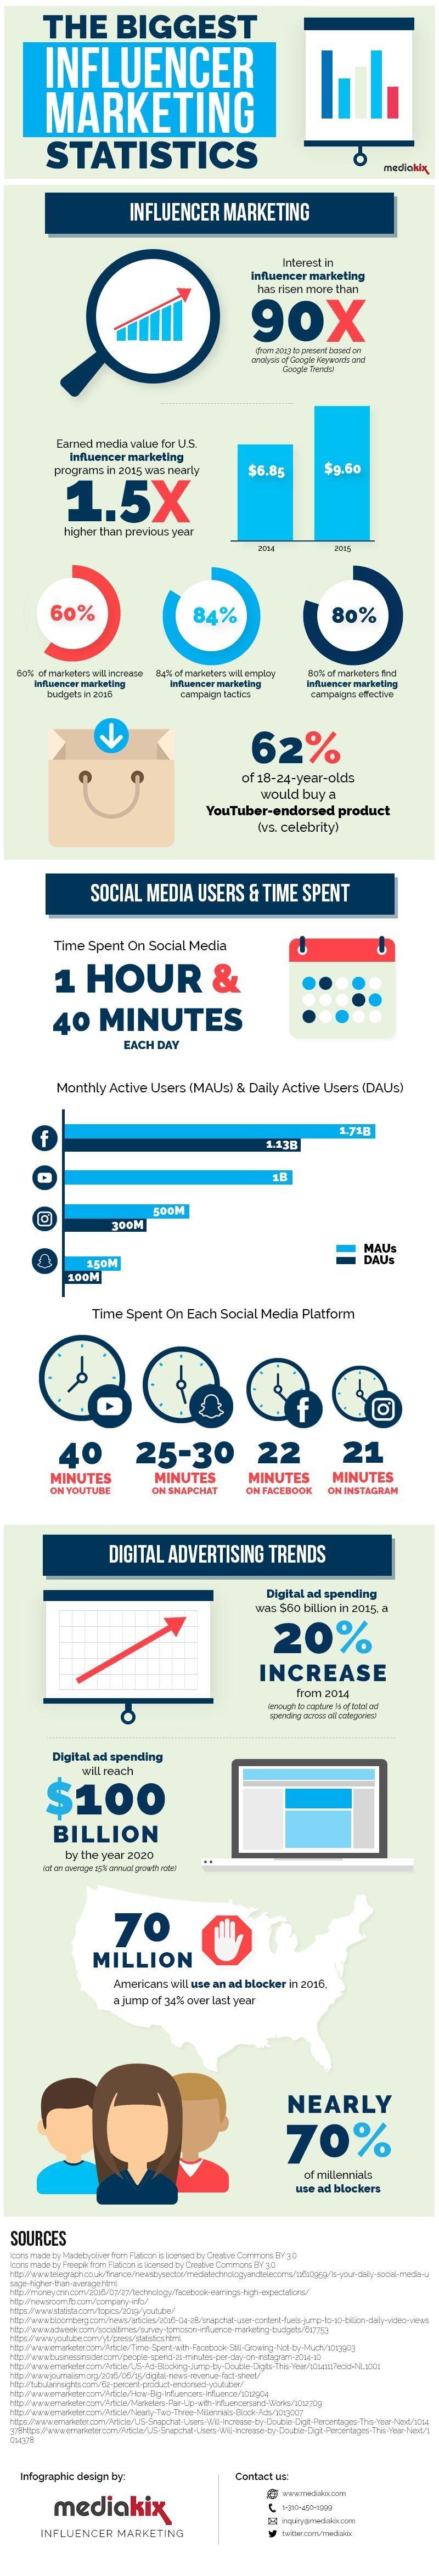 The biggest influencer #Marketing statistics #SMM #Infographic